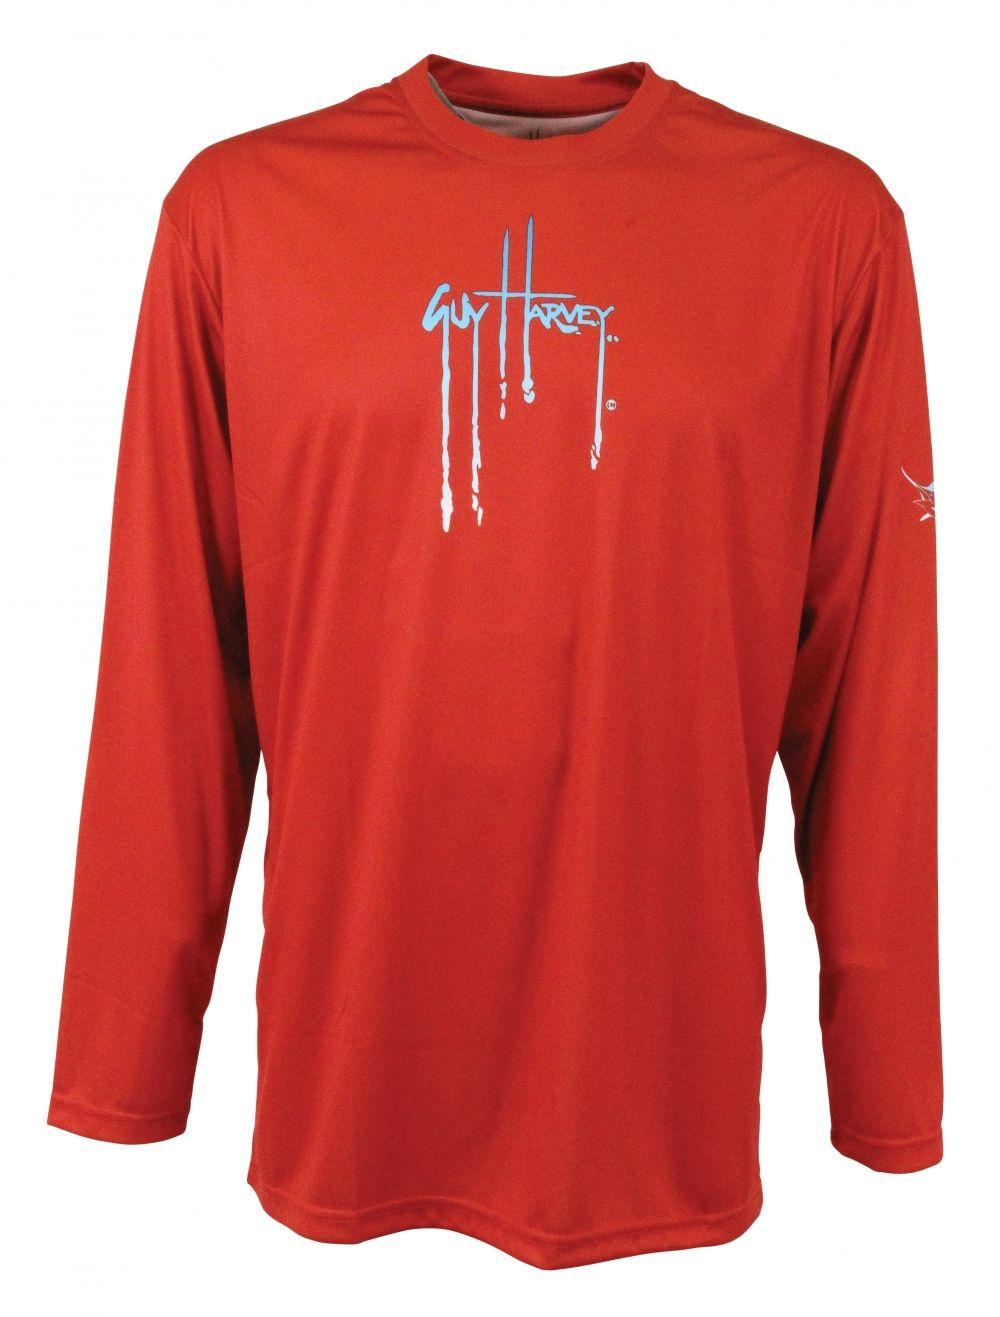 Guy Harvey Grafitti Performance T Shirt Salty Clothes